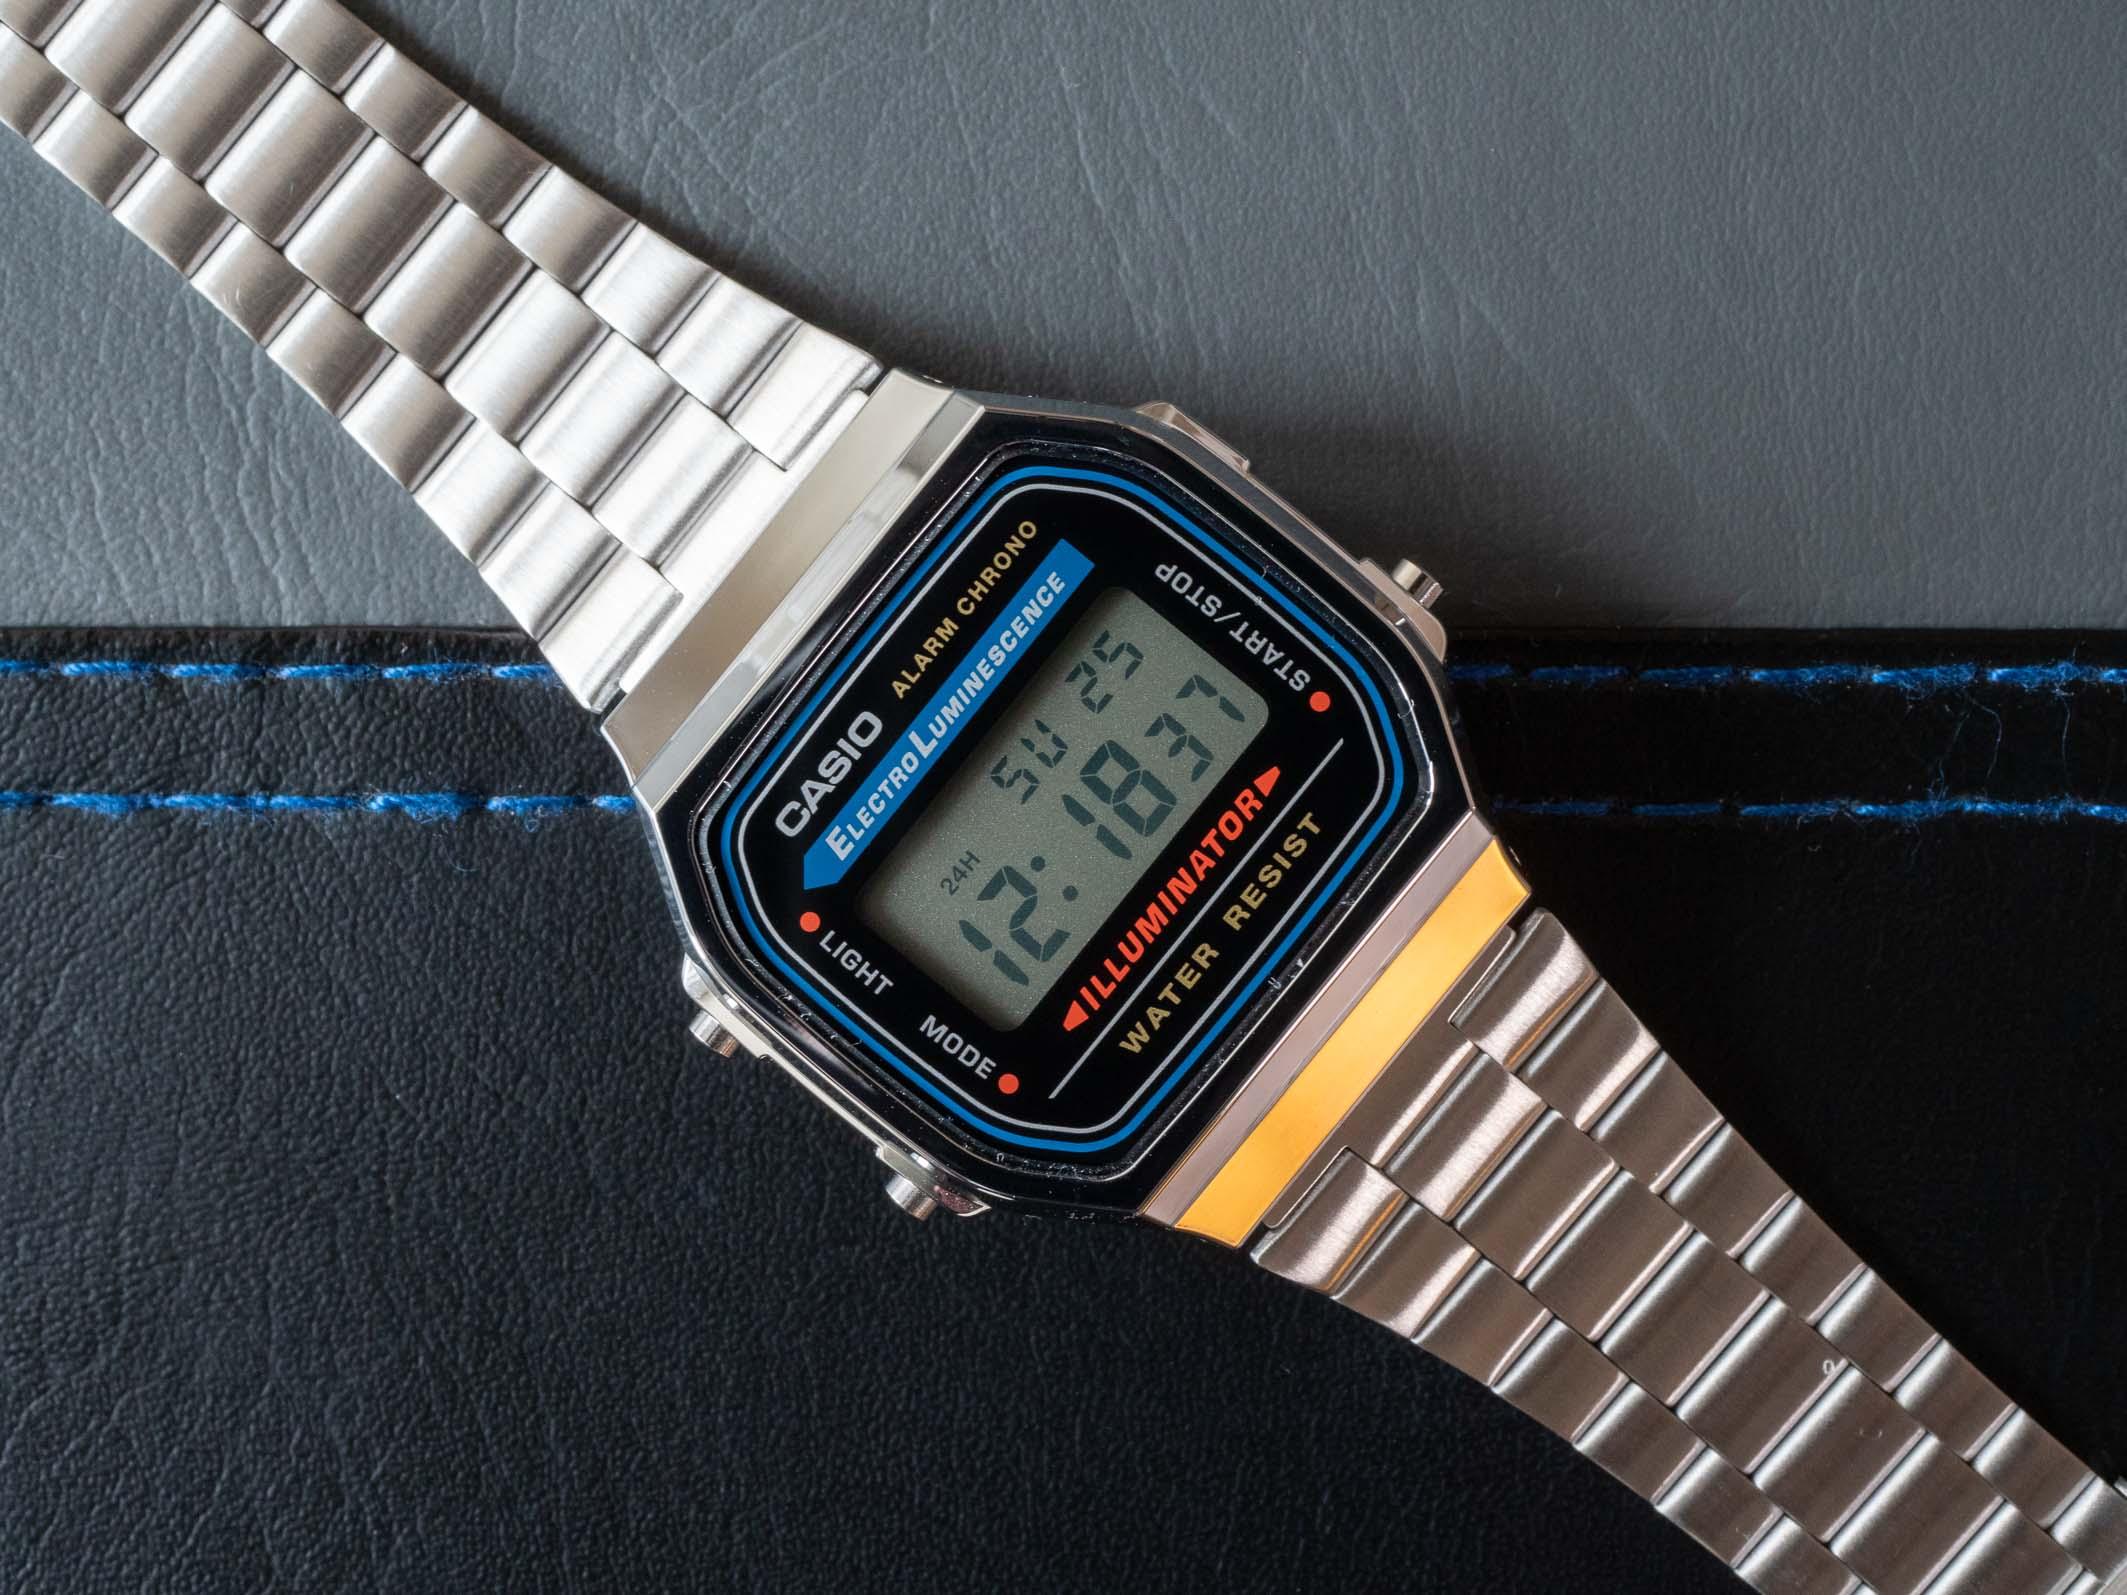 Casio A168 digital watch